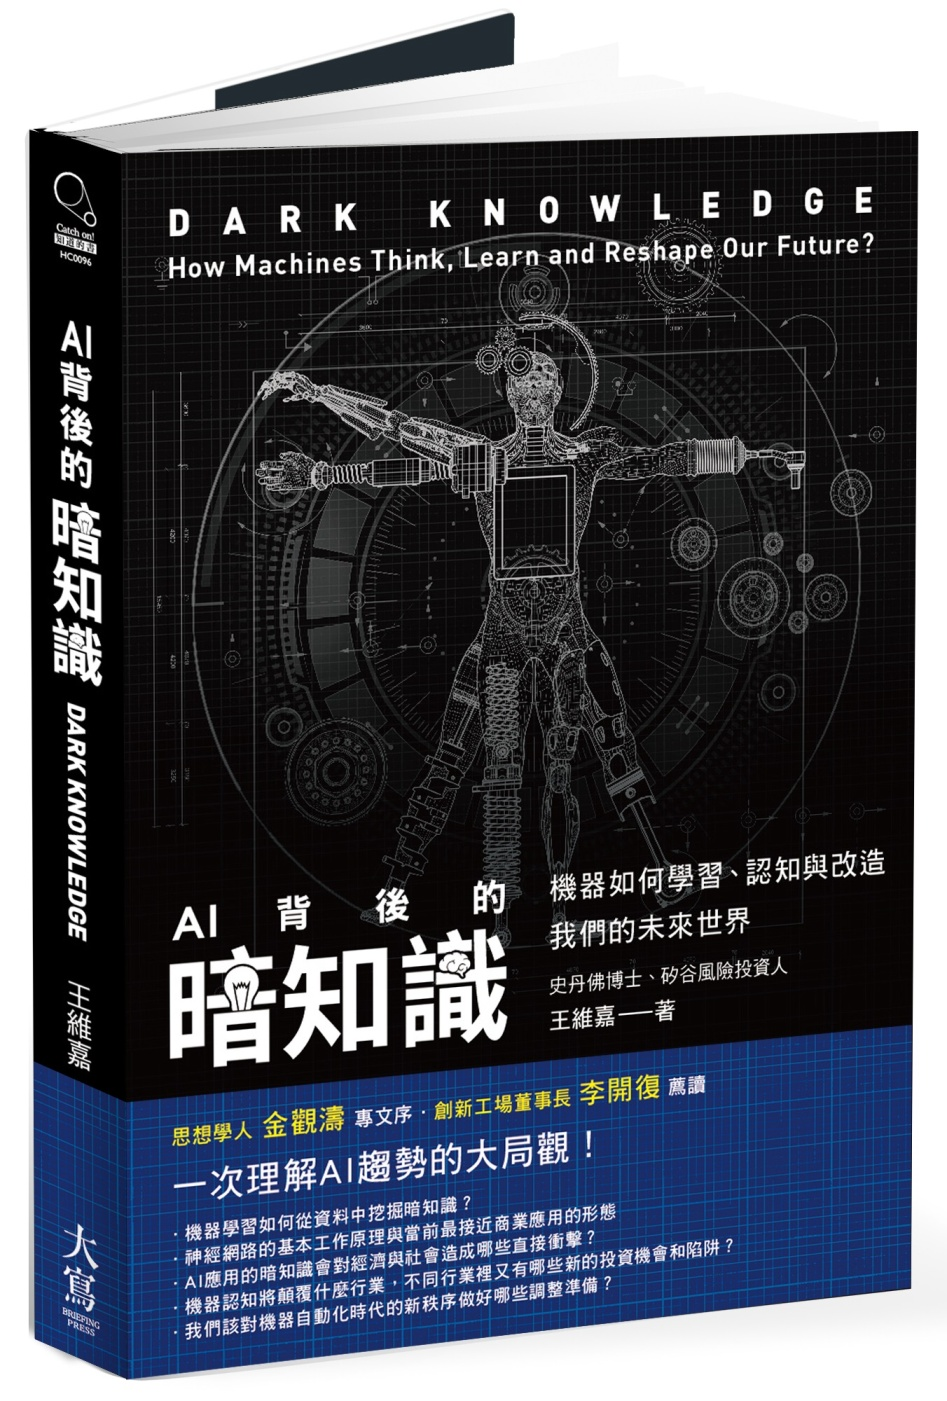 AI背後的暗知識:機器如何學習、認知與改造我們的未來世界